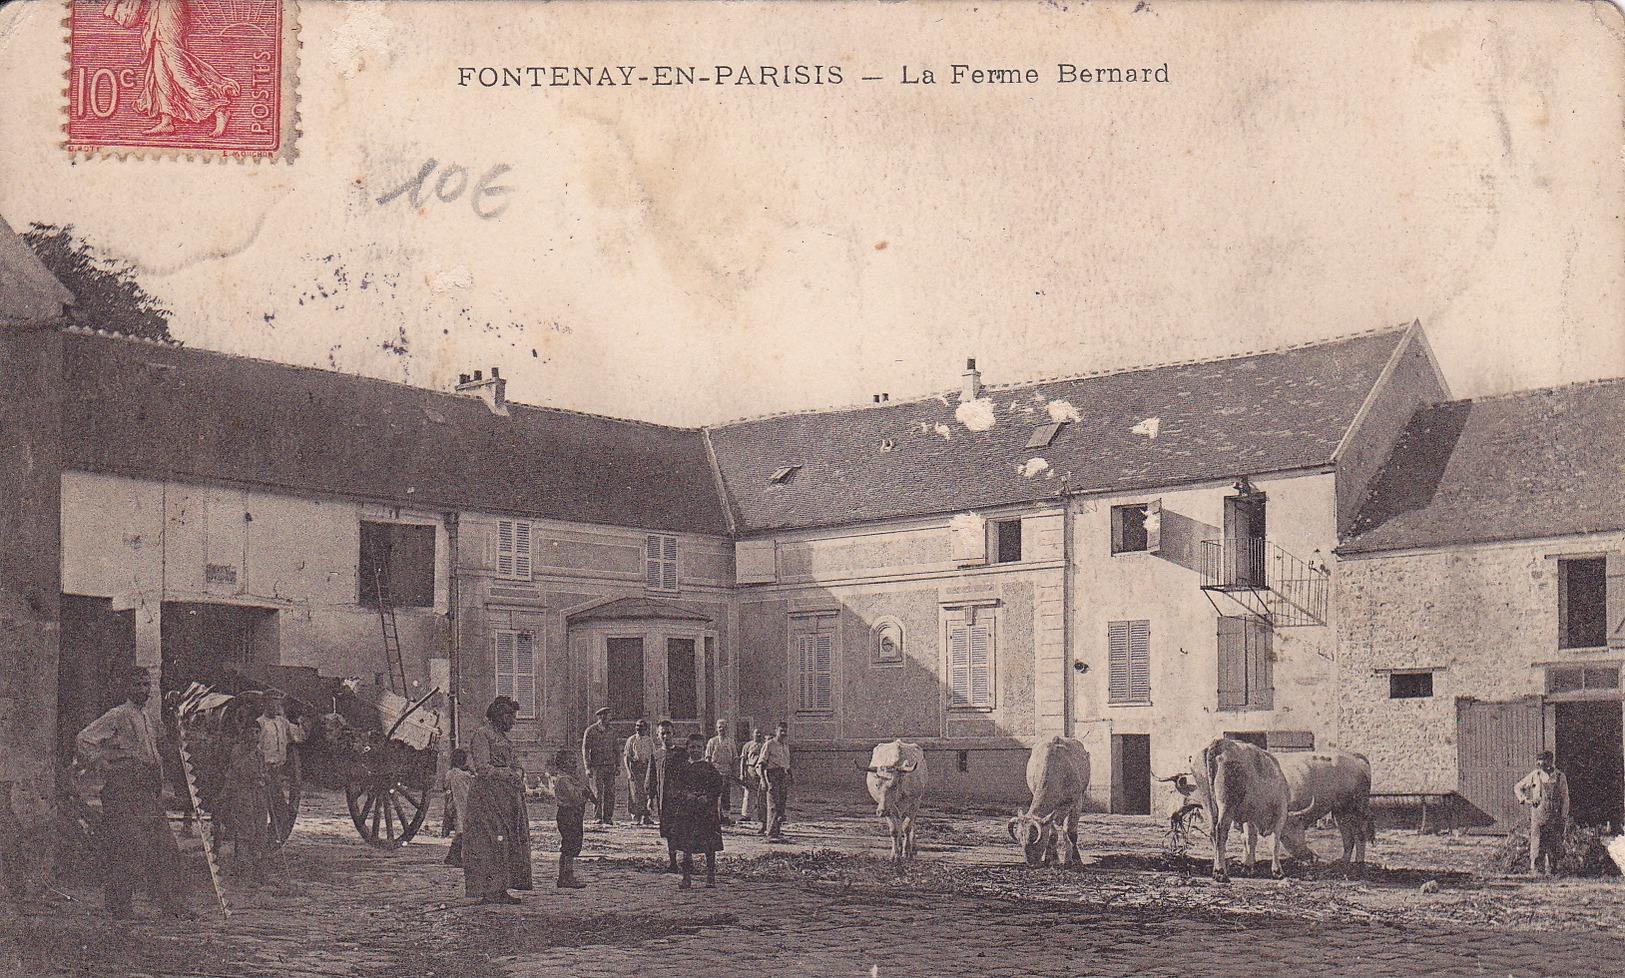 FONTENAY EN PARISIS - La Ferme Bernard - France